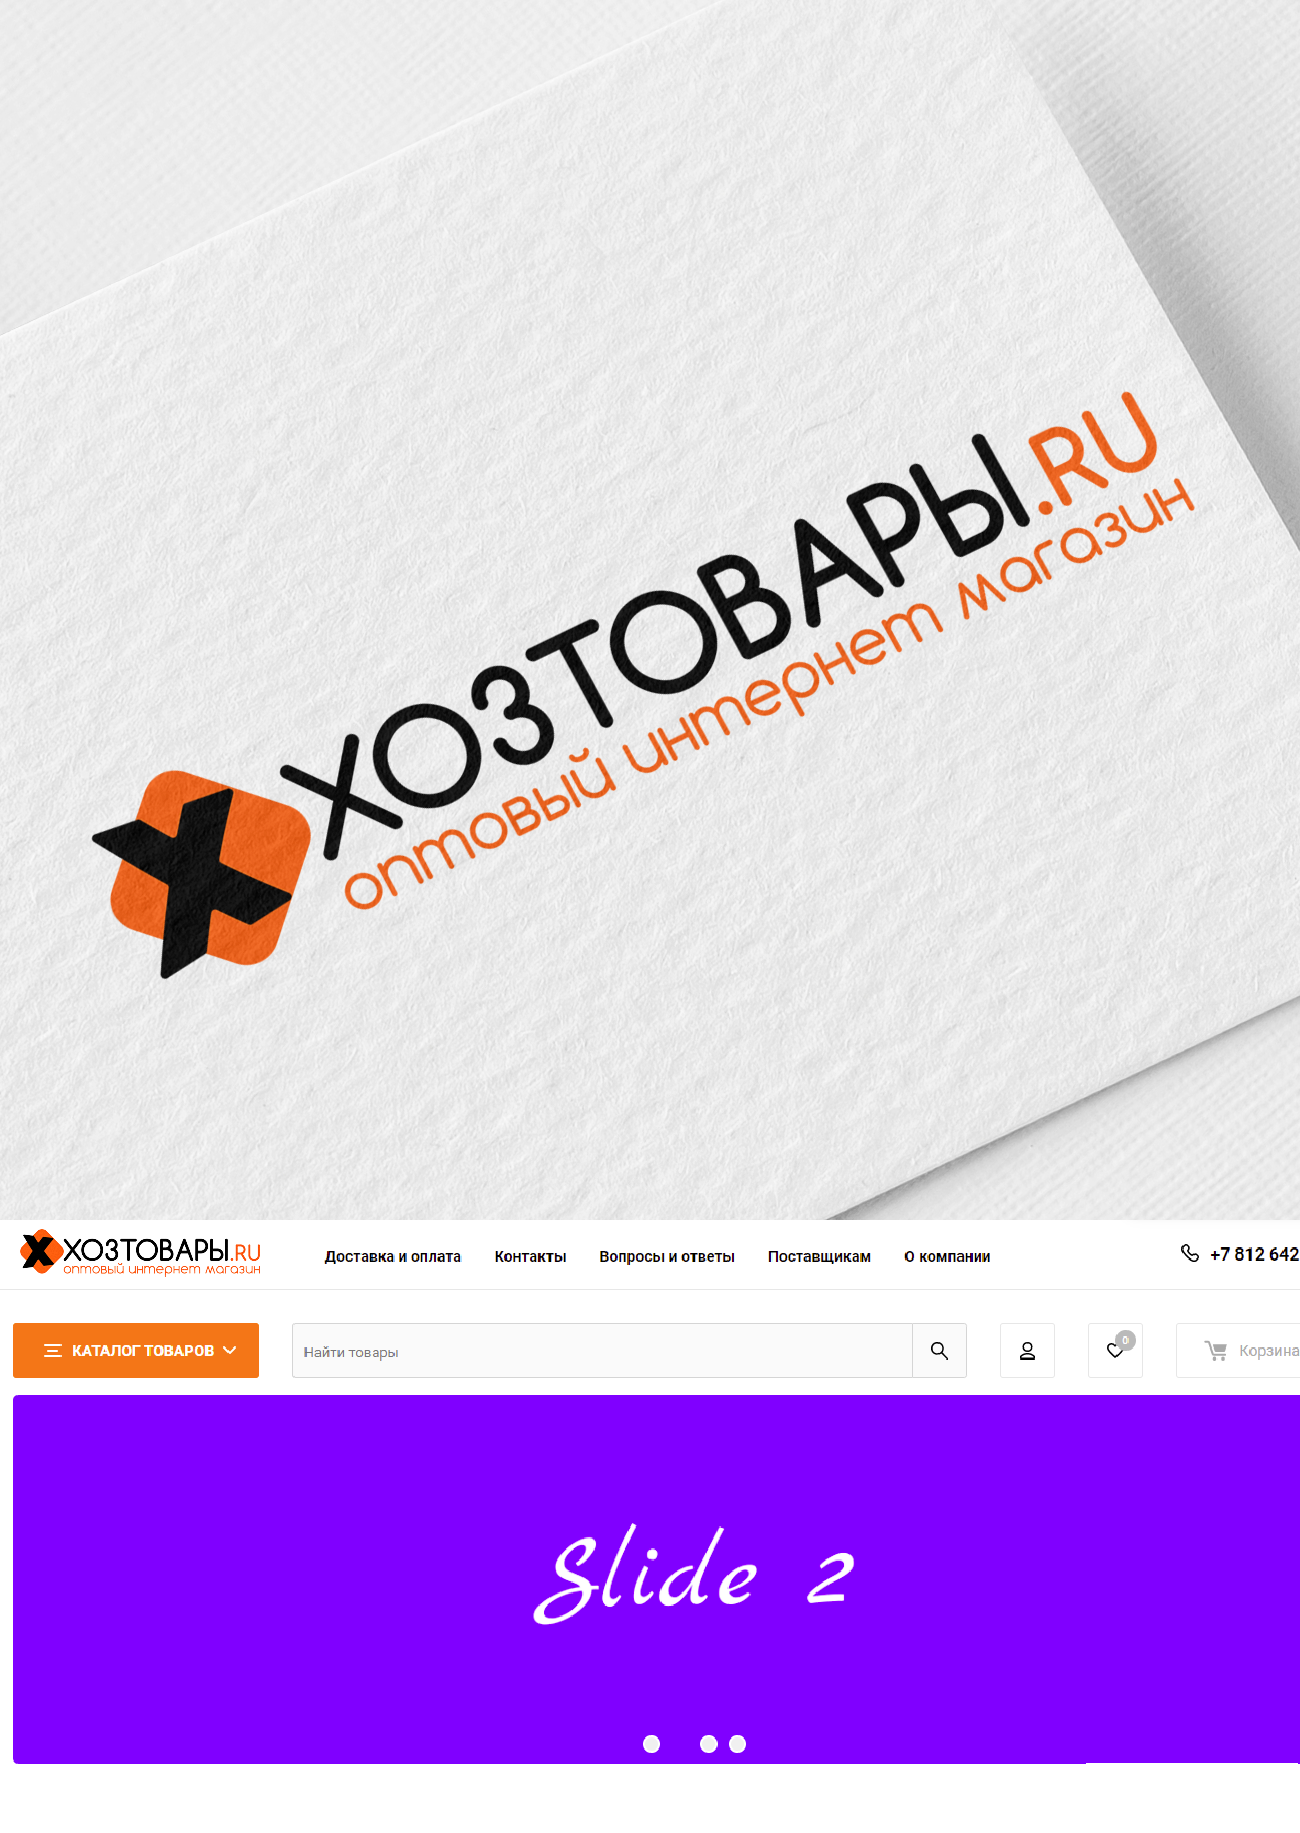 Разработка логотипа для оптового интернет-магазина «Хозтовары.ру» фото f_846606ddd19075e2.png